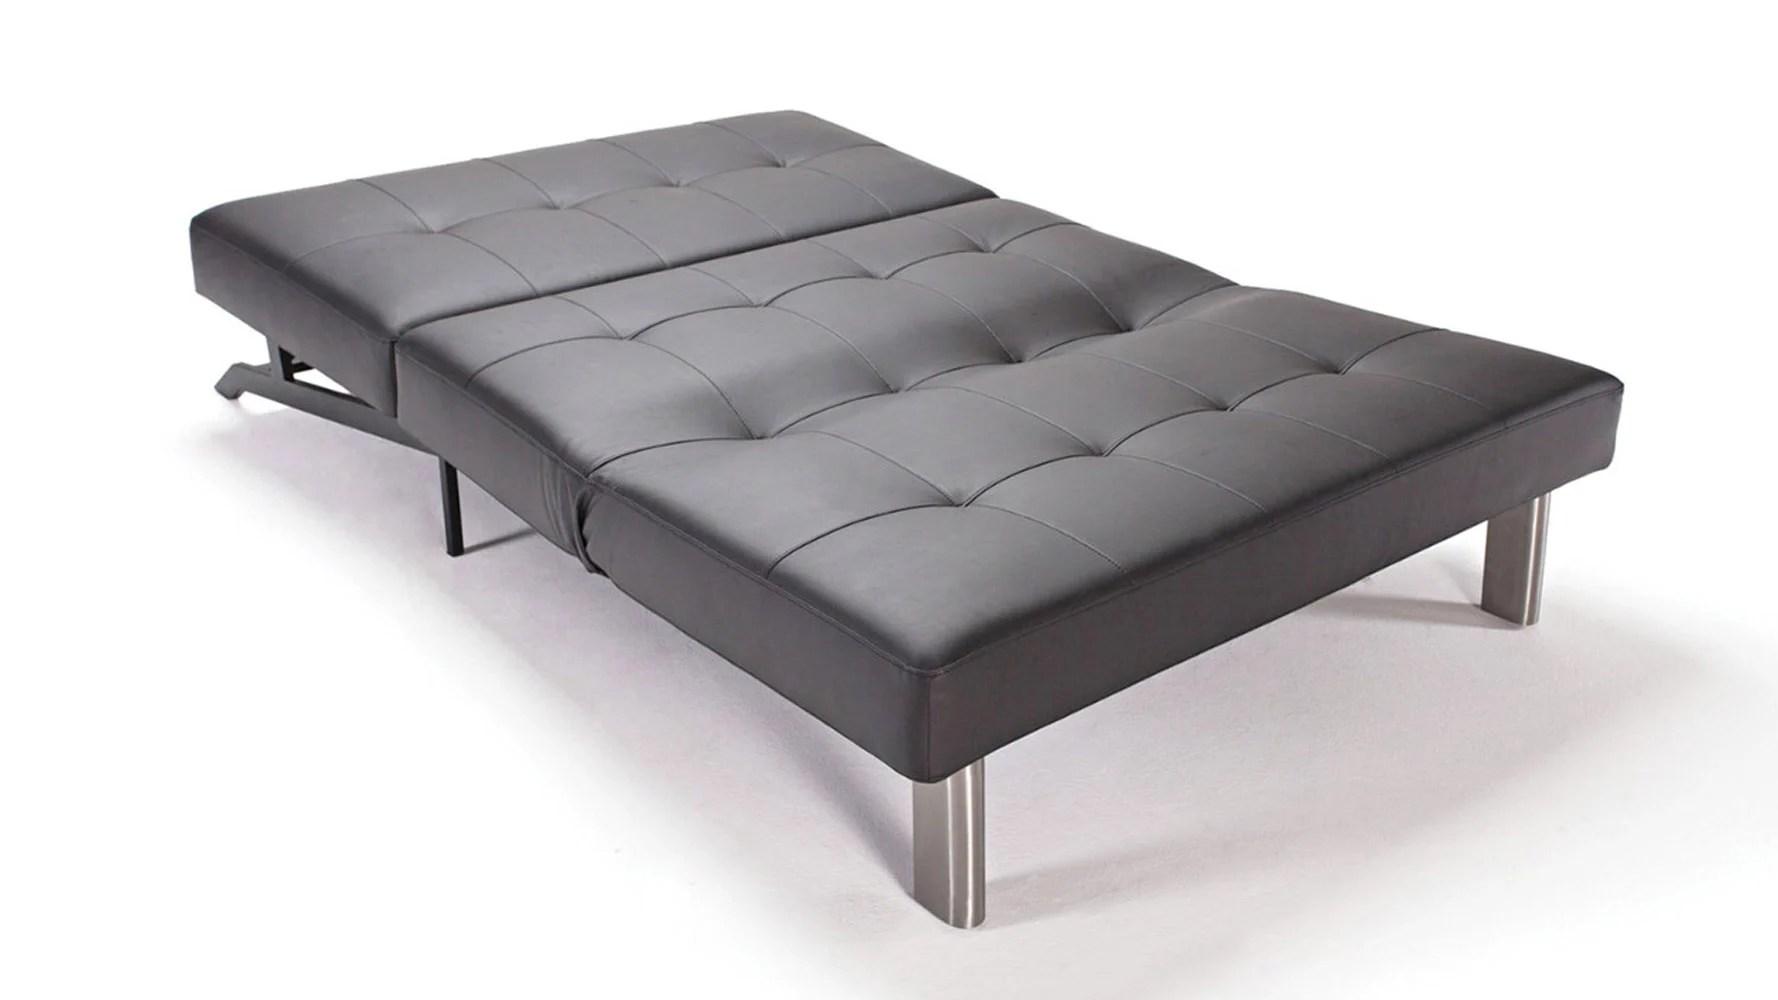 sofa steel target white slipcovers bed design www gradschoolfairs